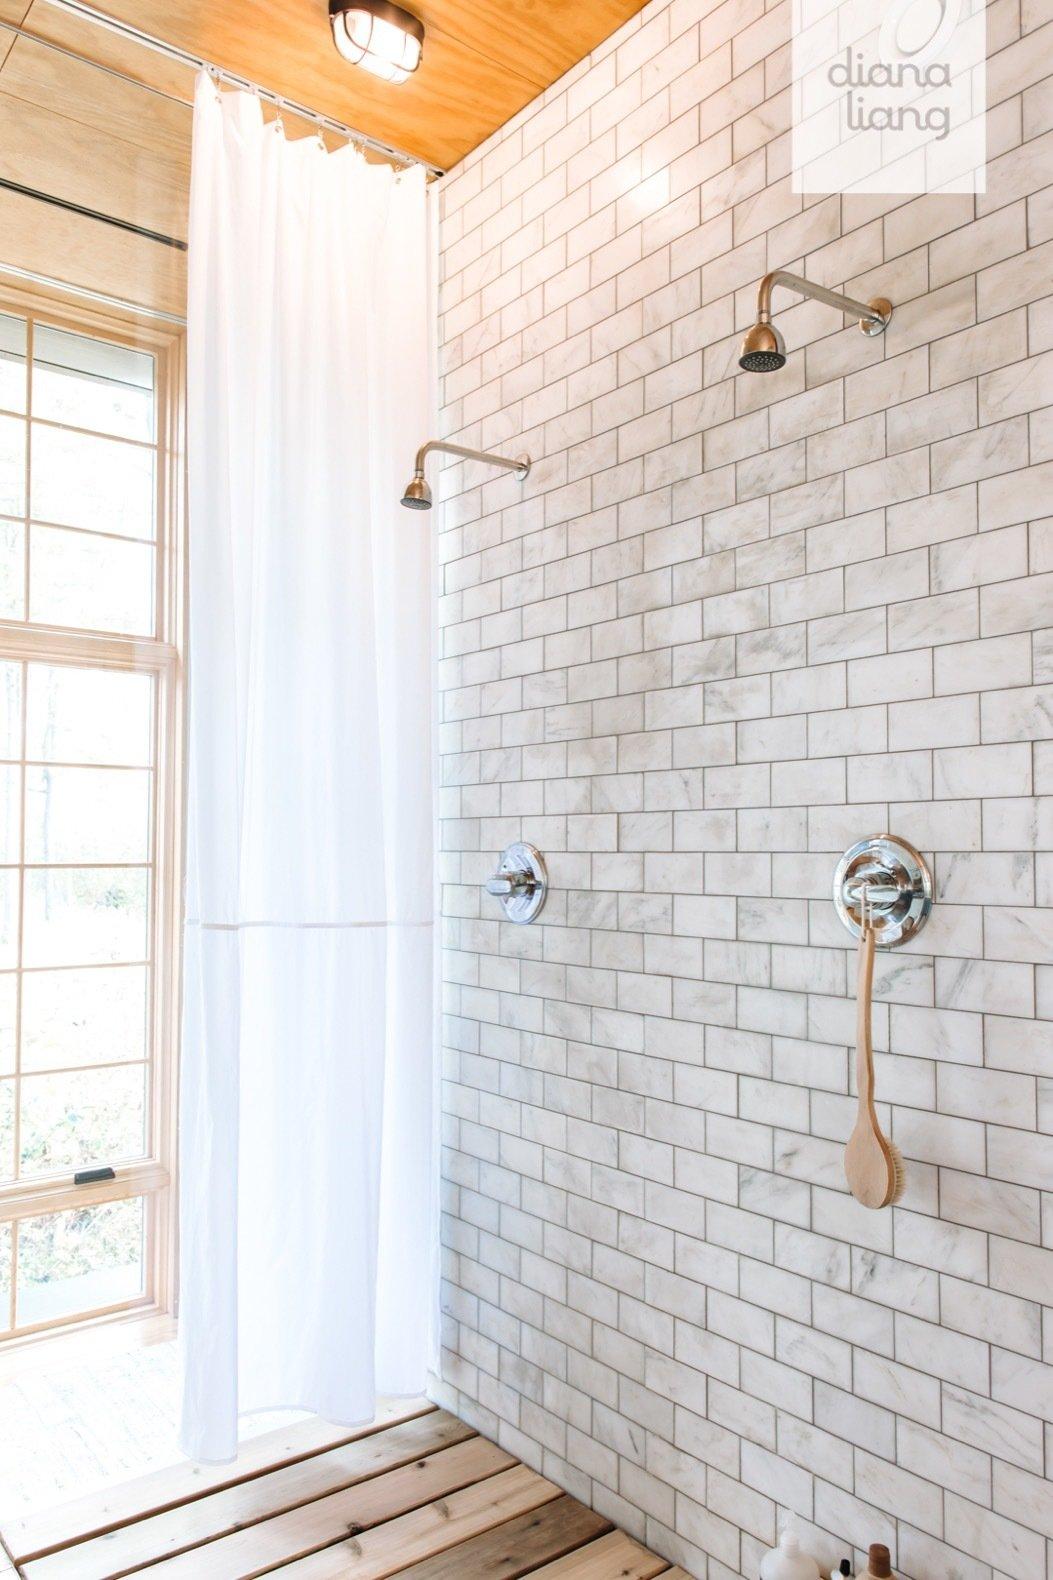 Hygge Supply Lake House prefab shower